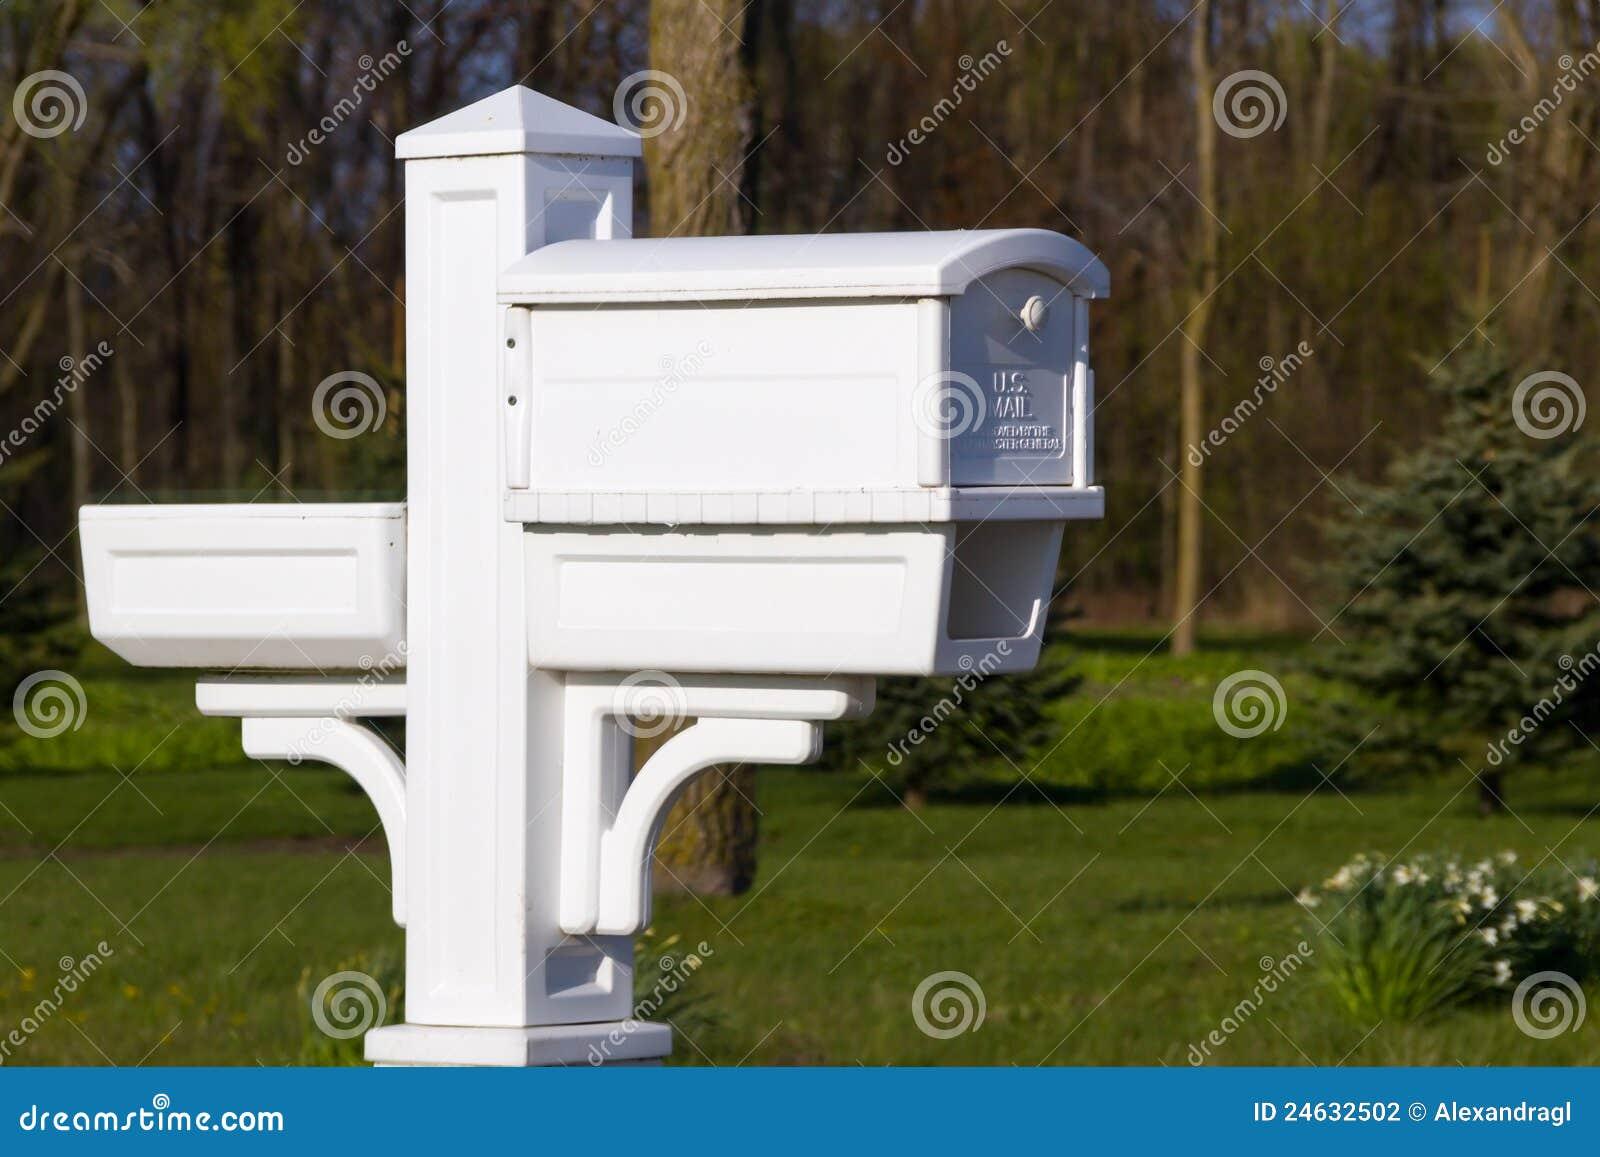 bo te aux lettres am ricaine photo stock image du. Black Bedroom Furniture Sets. Home Design Ideas